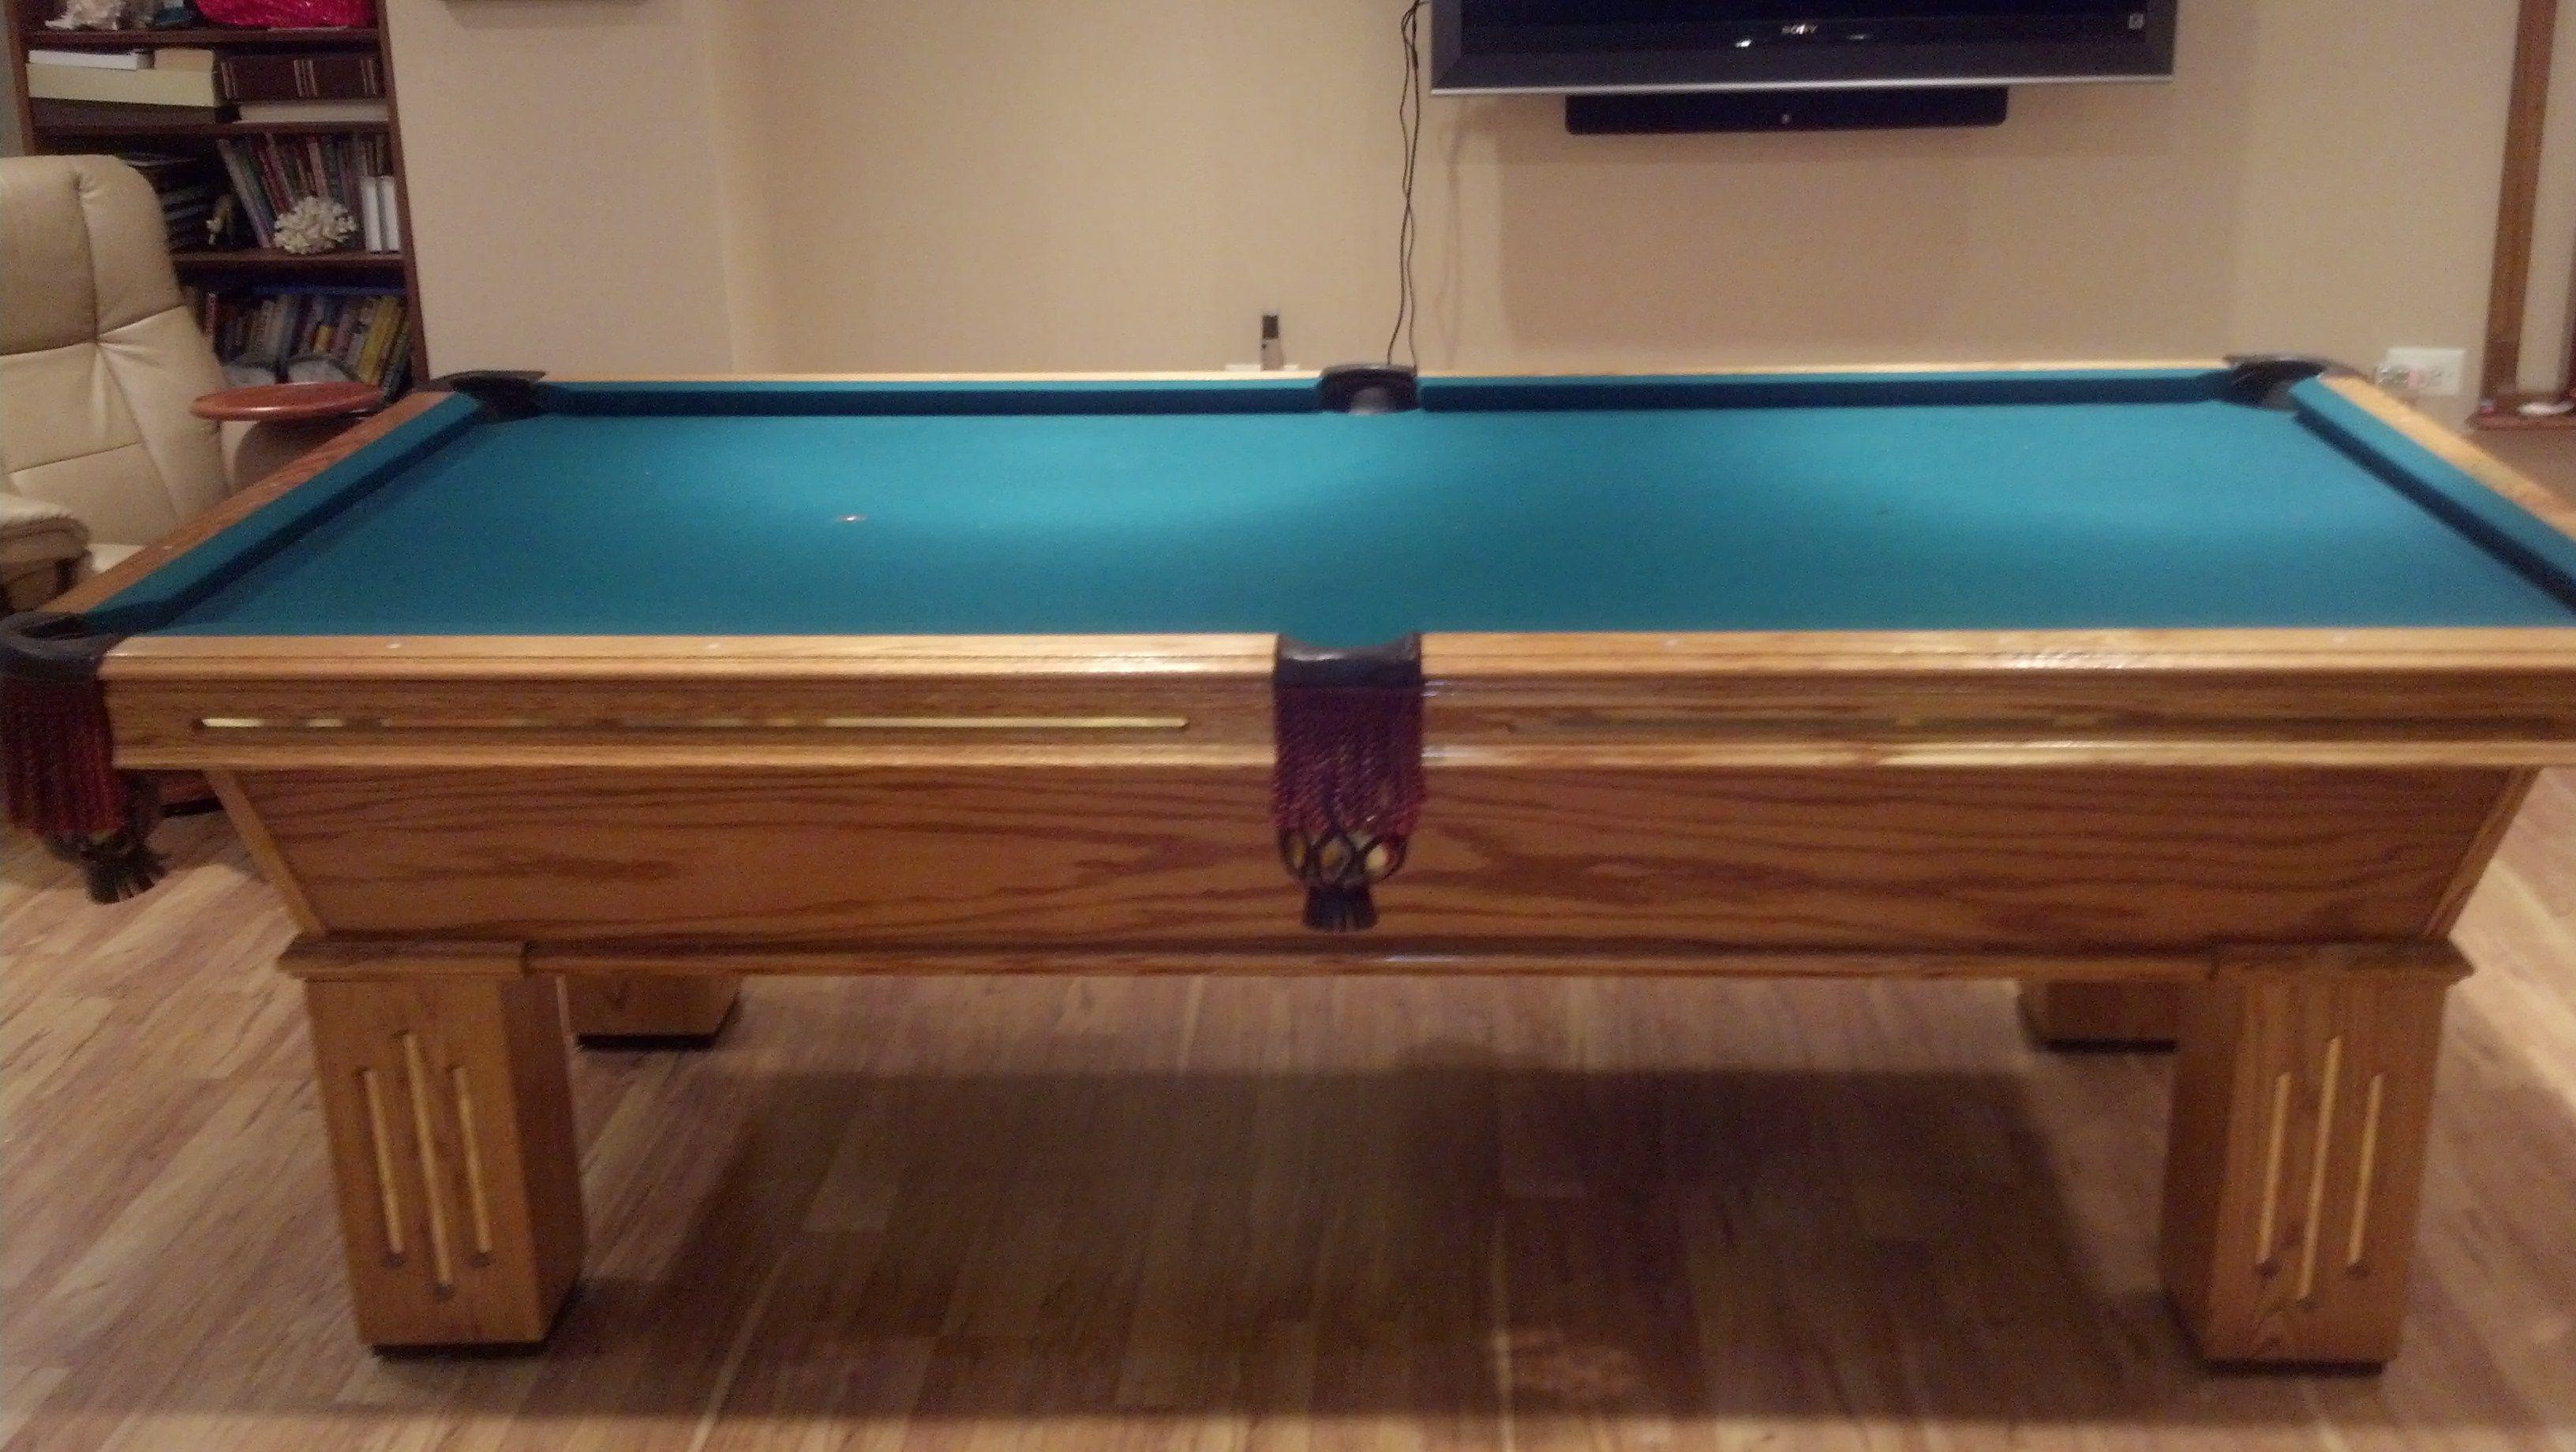 For Sale Olhausen Billiards Gem 8 Pool Table Mint Condition Sold Billiard Pool Table Pool Table Billiards